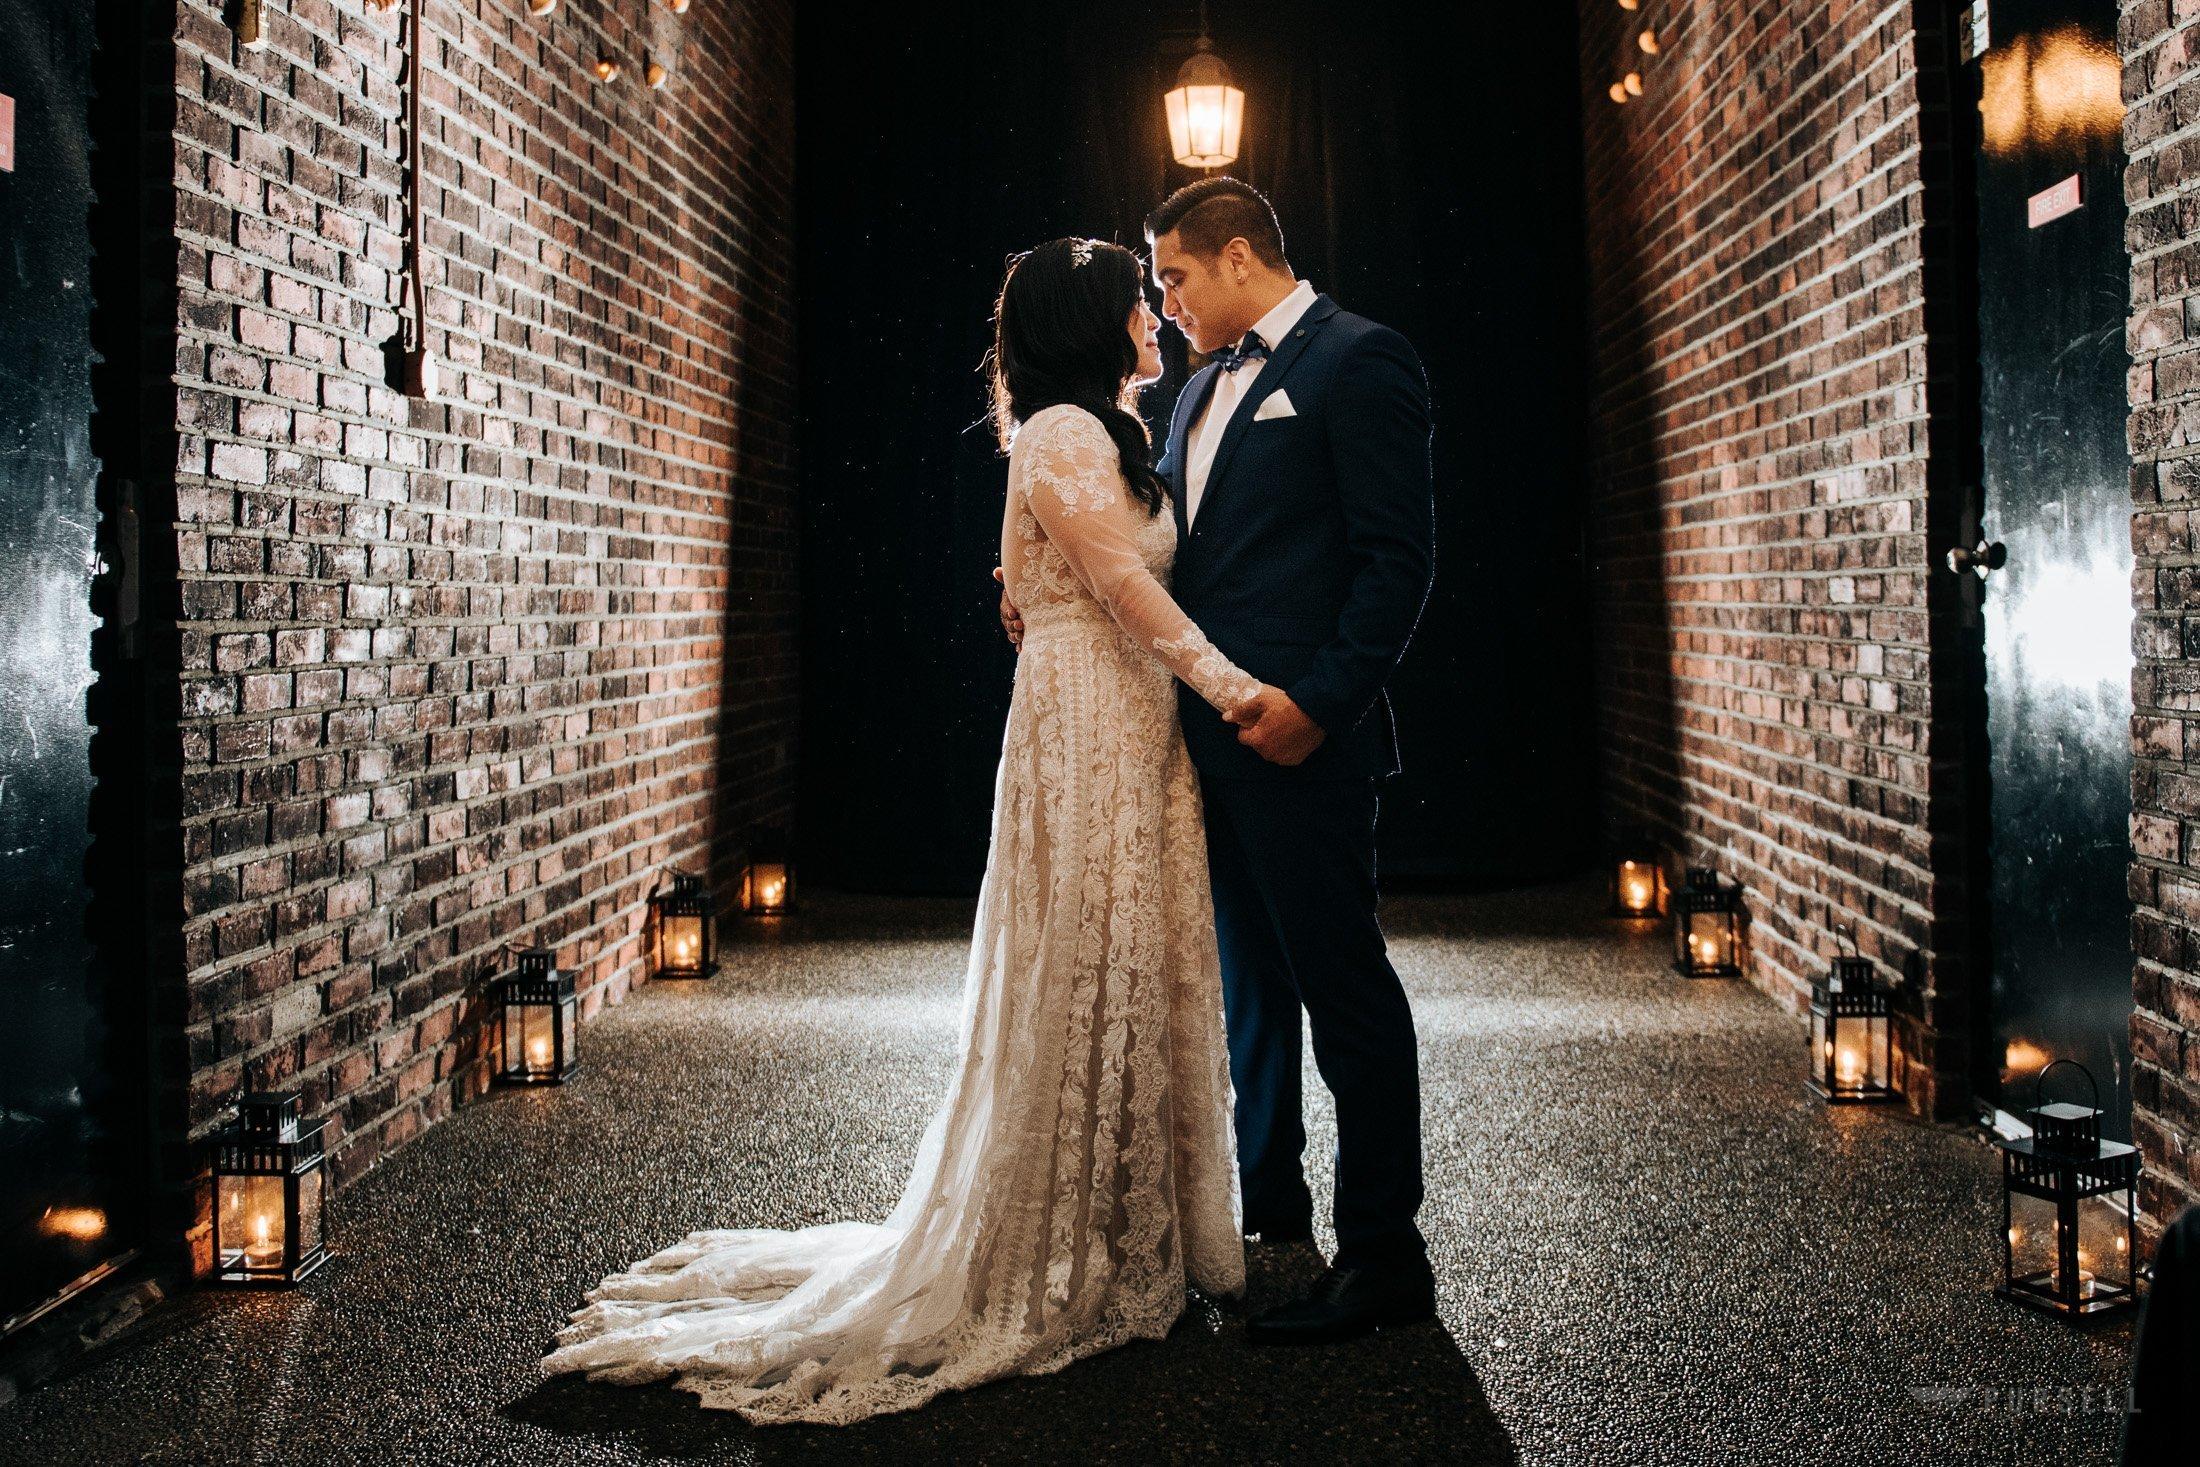 014 - brix and mortar wedding yaletown